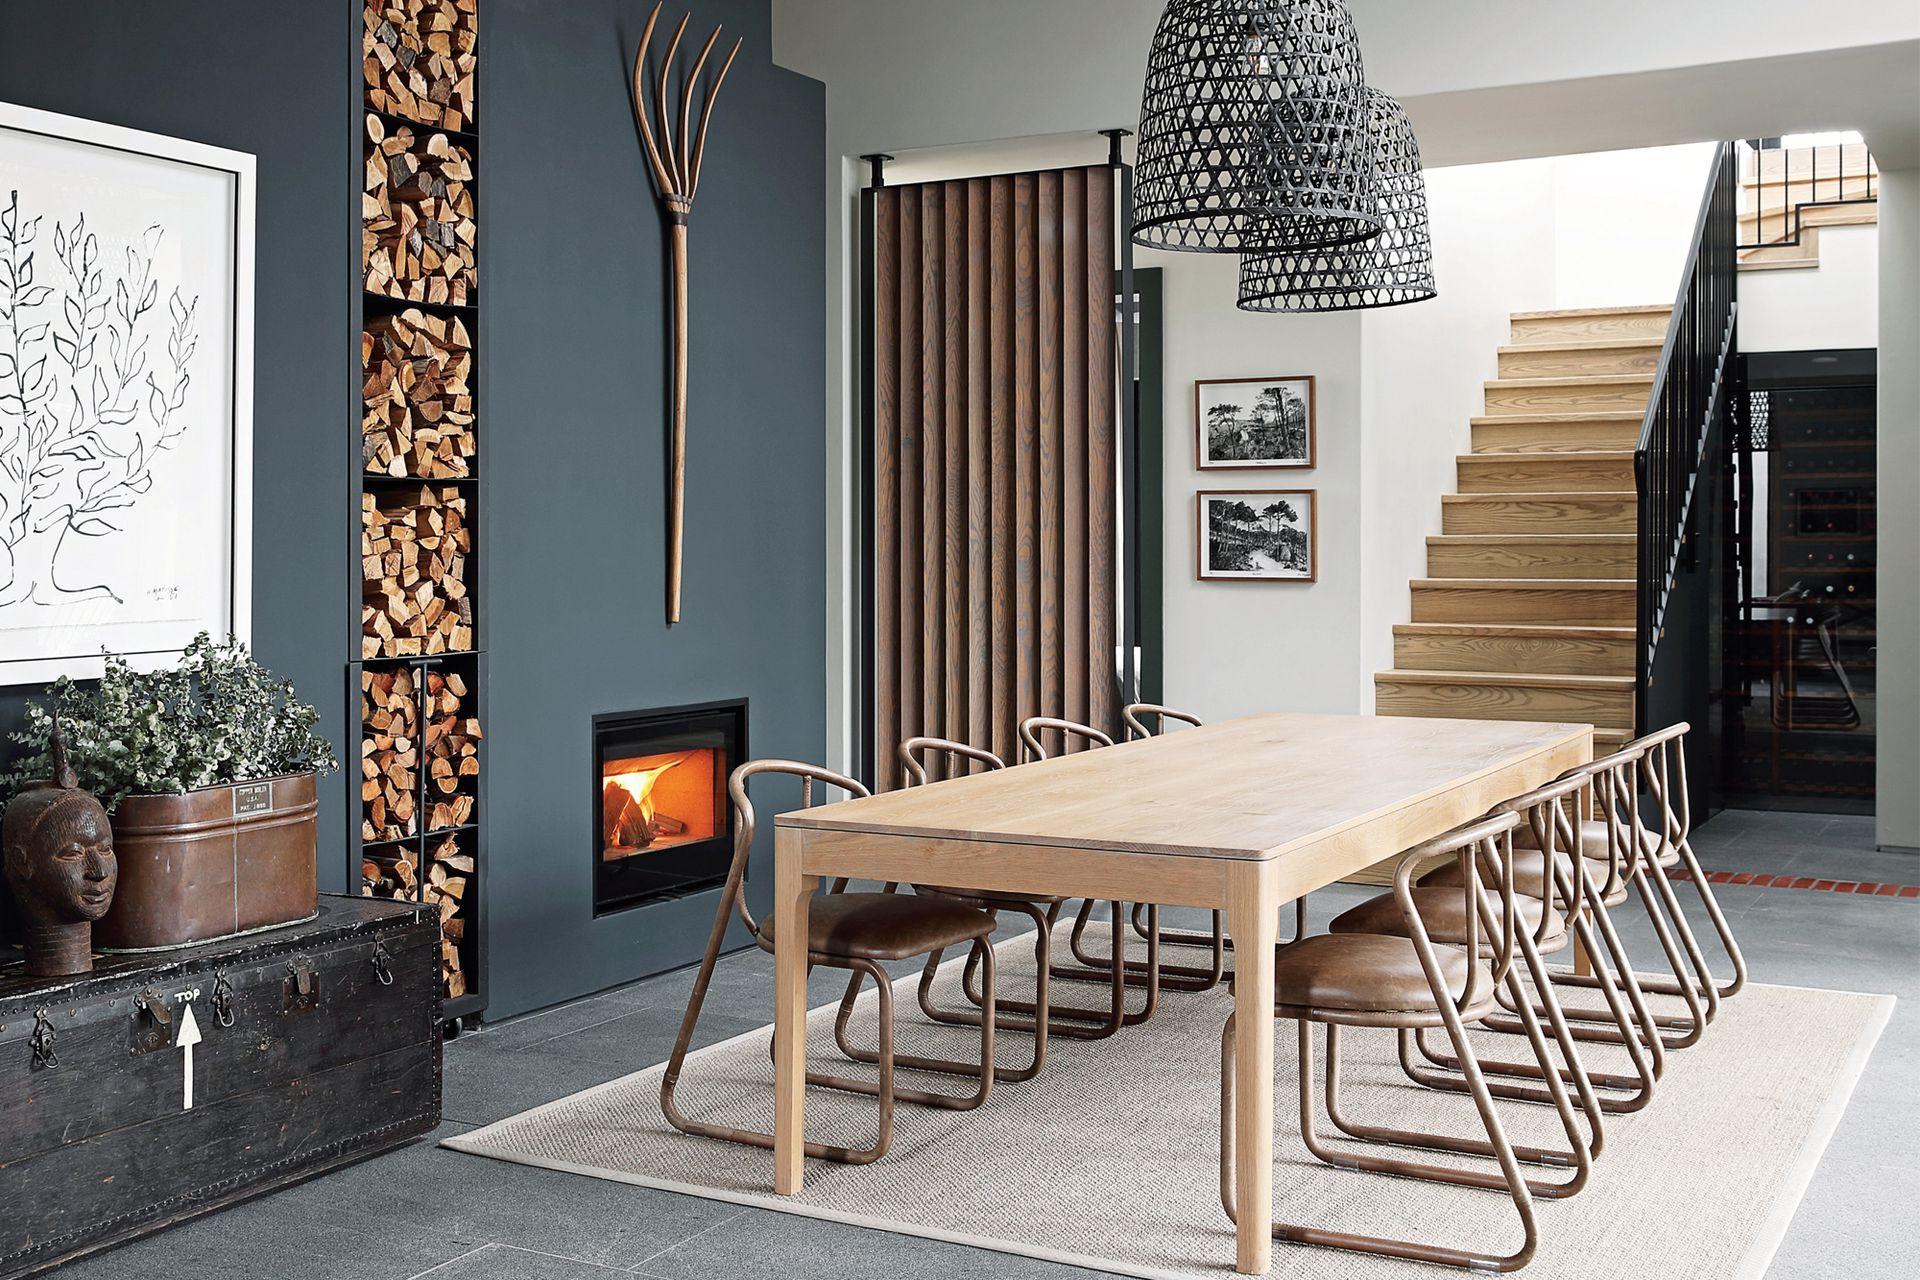 Chimenea (Charnwood). Mesa 'Harris' (James Mudge). Sillas de acero tubular con asiento tapizado en cuero (Studio 19). Lámparas colgantes (Loft Living).